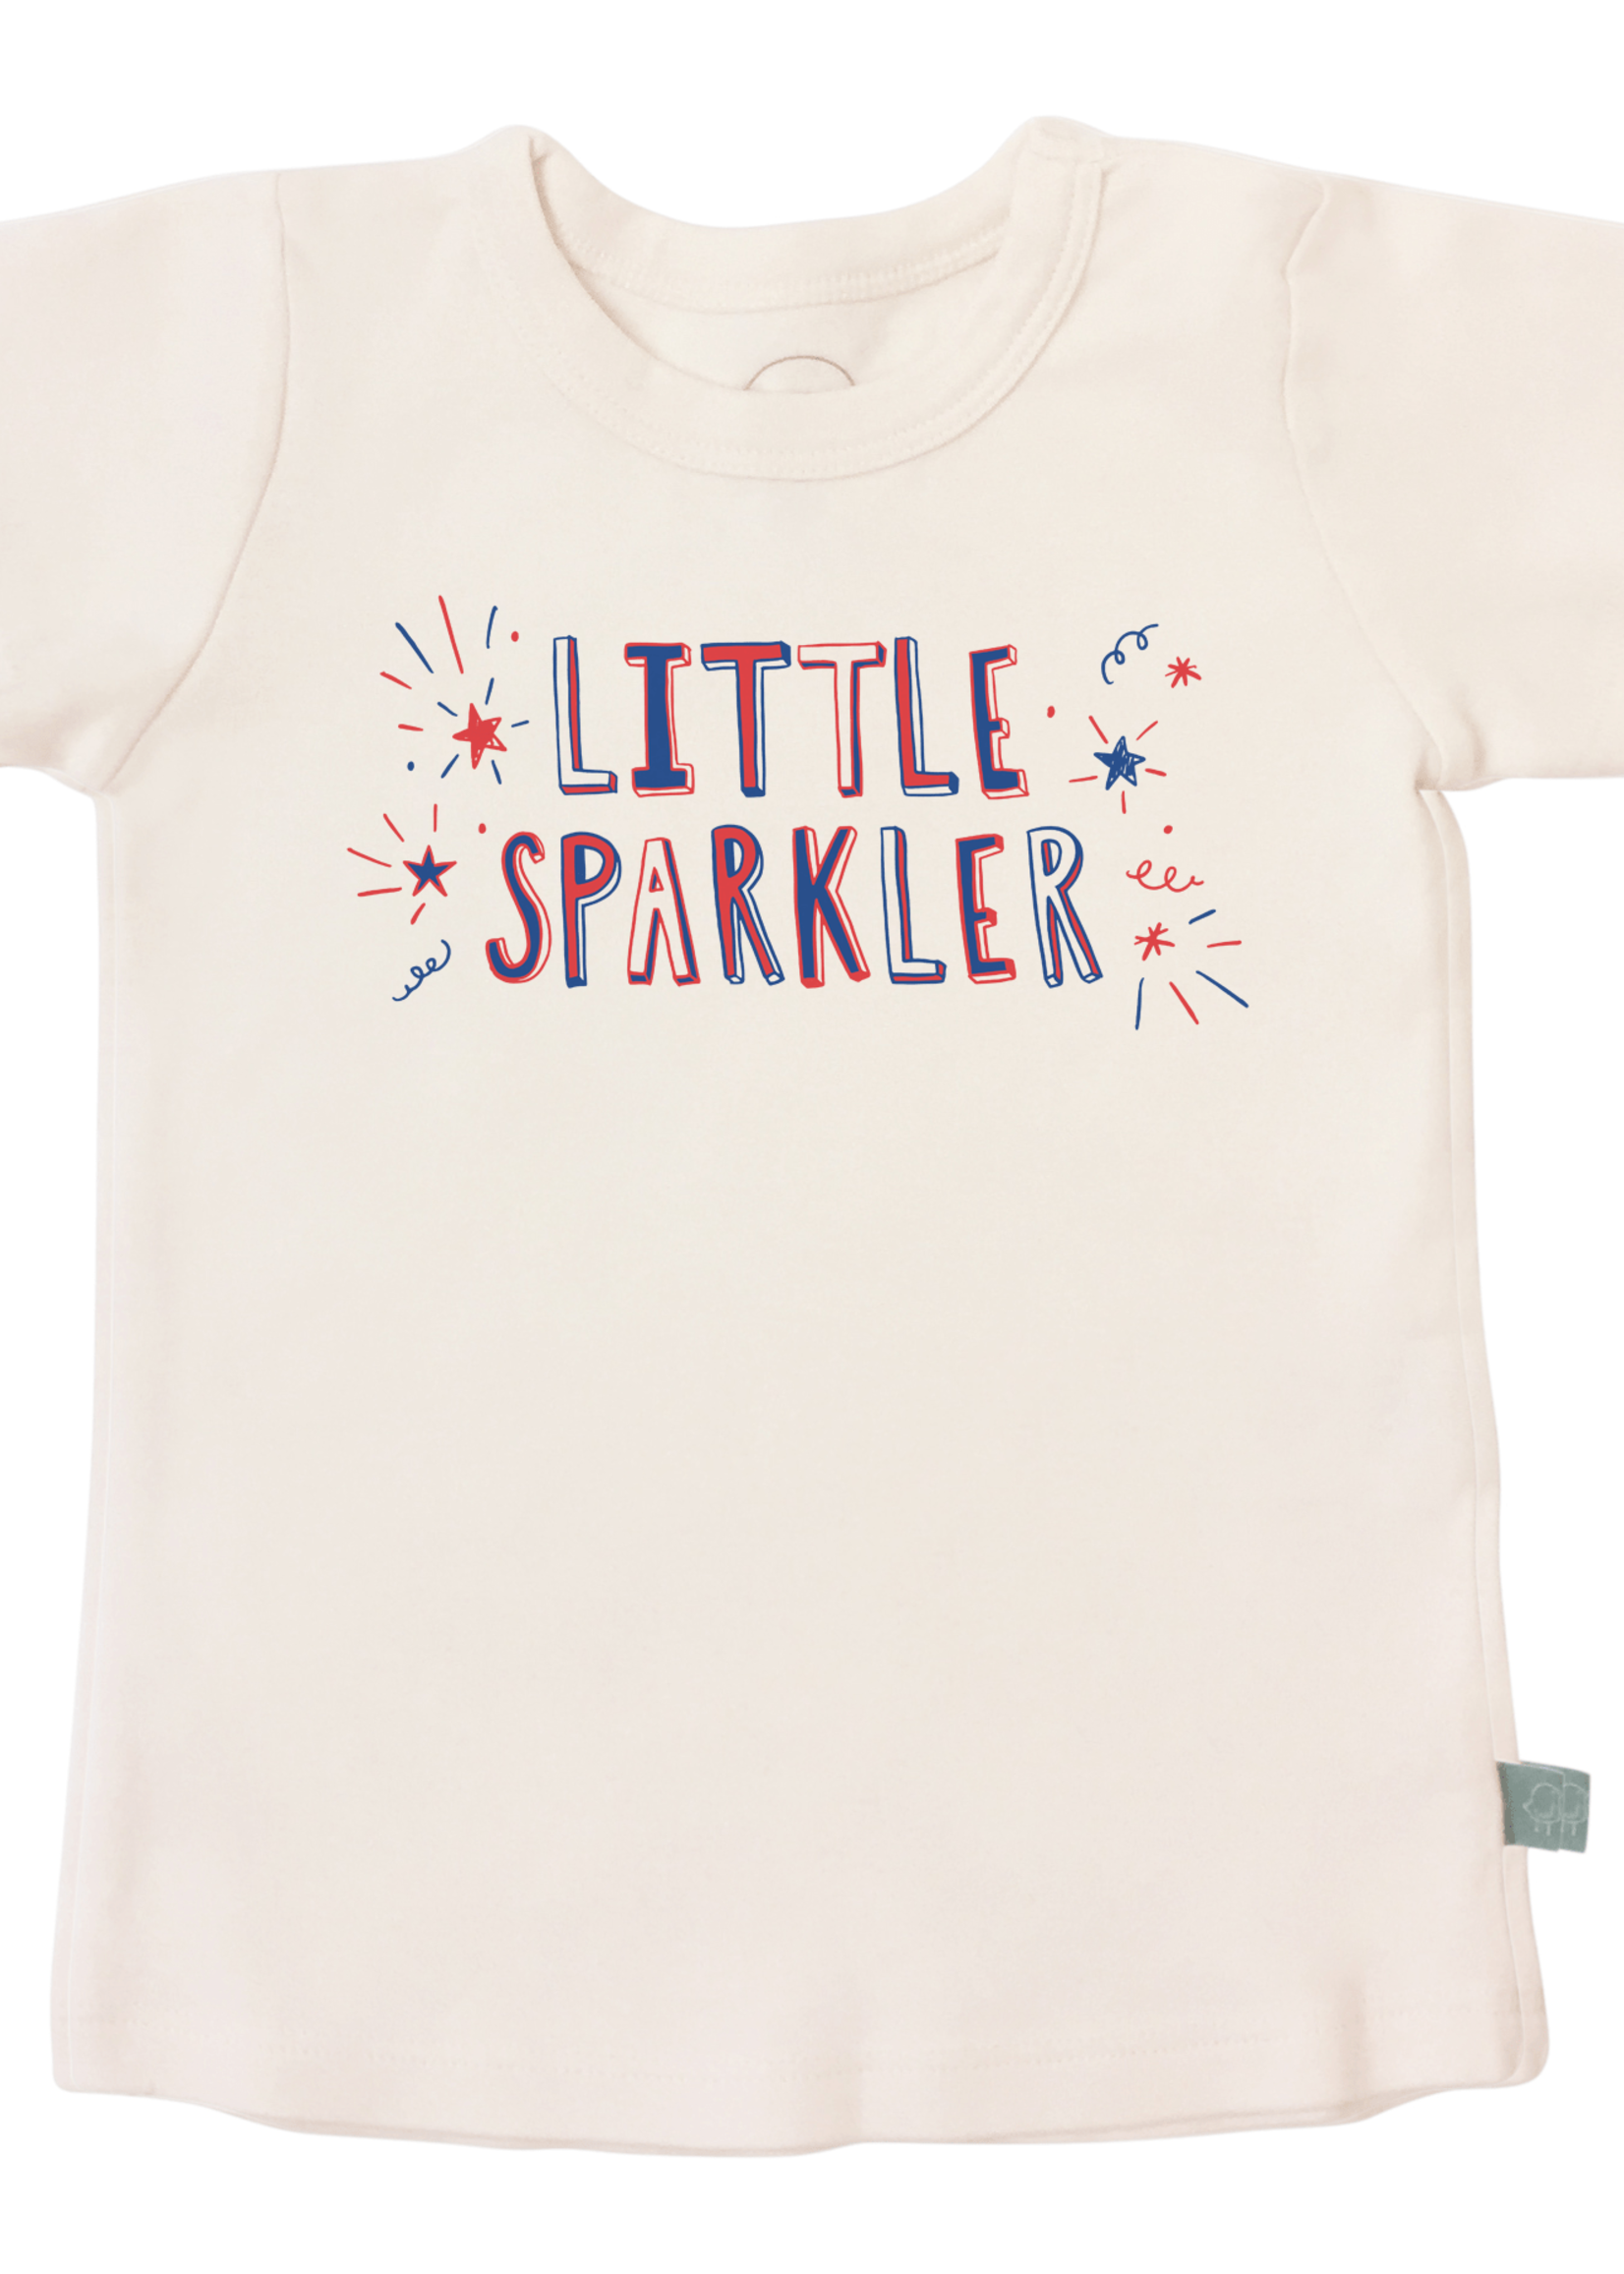 Finn and emma Little Sparkler Tee